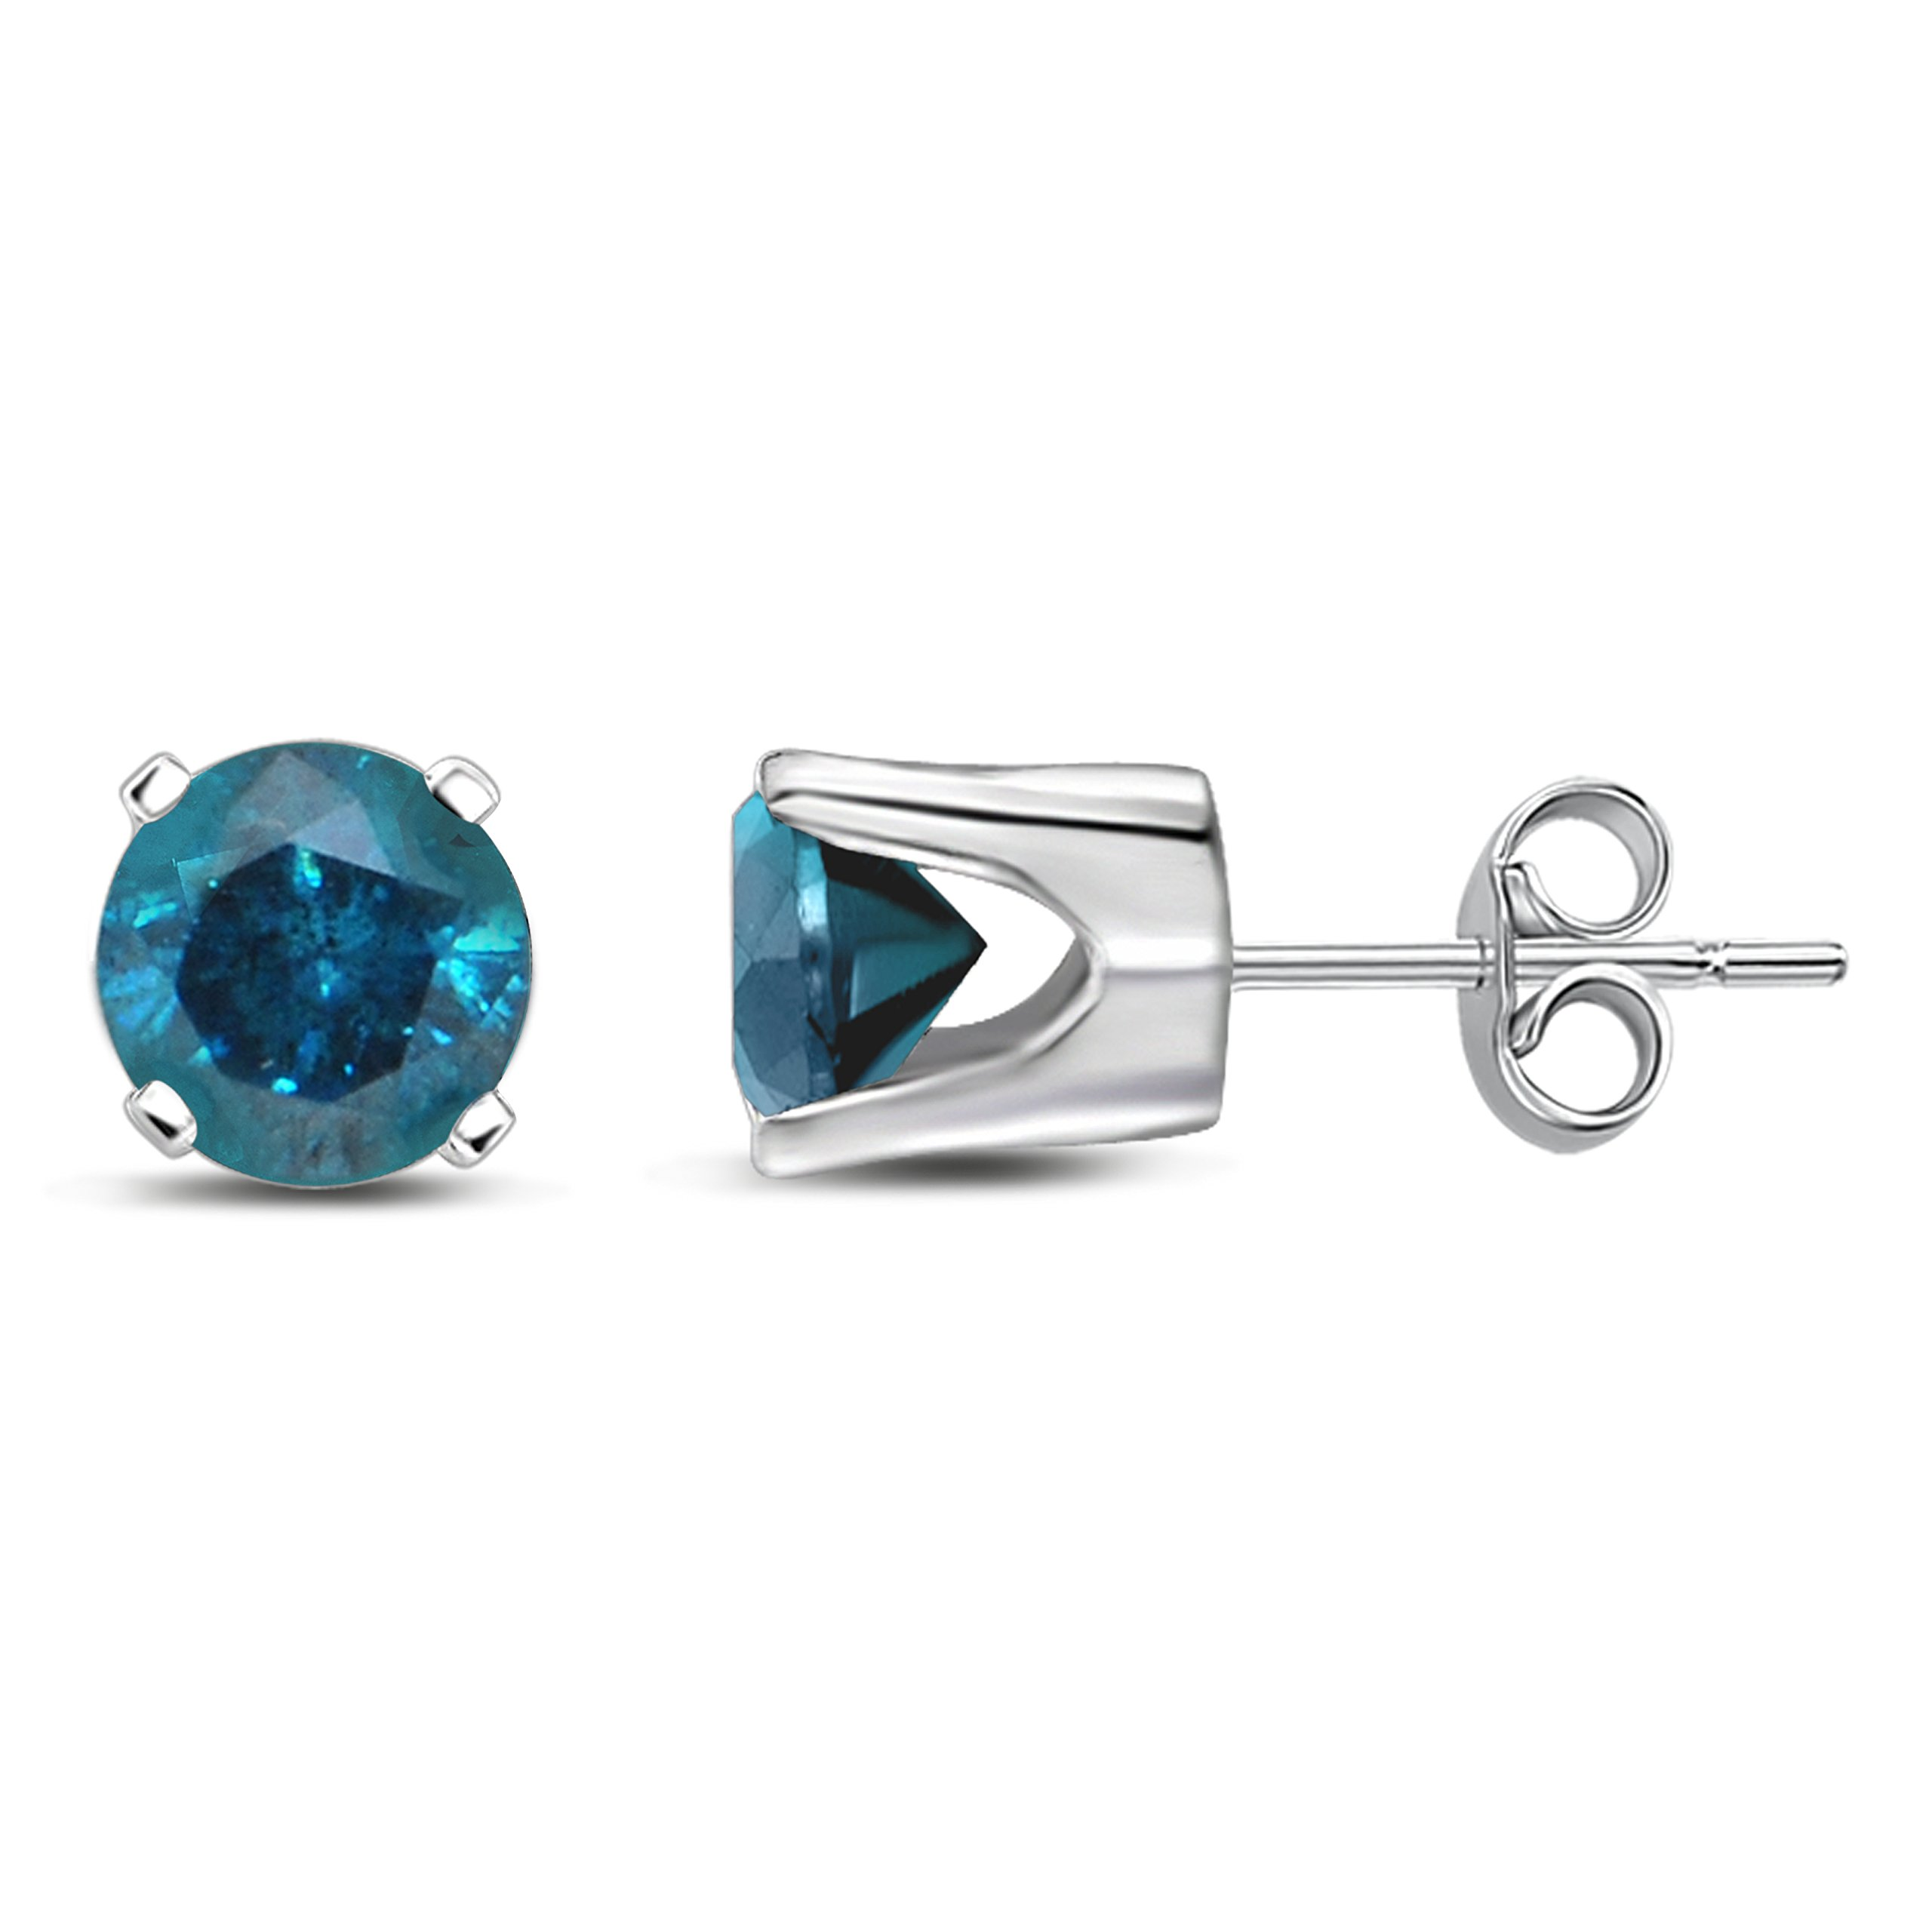 Diamond Jewel 14K White Gold Blue Diamond Stud Earrings